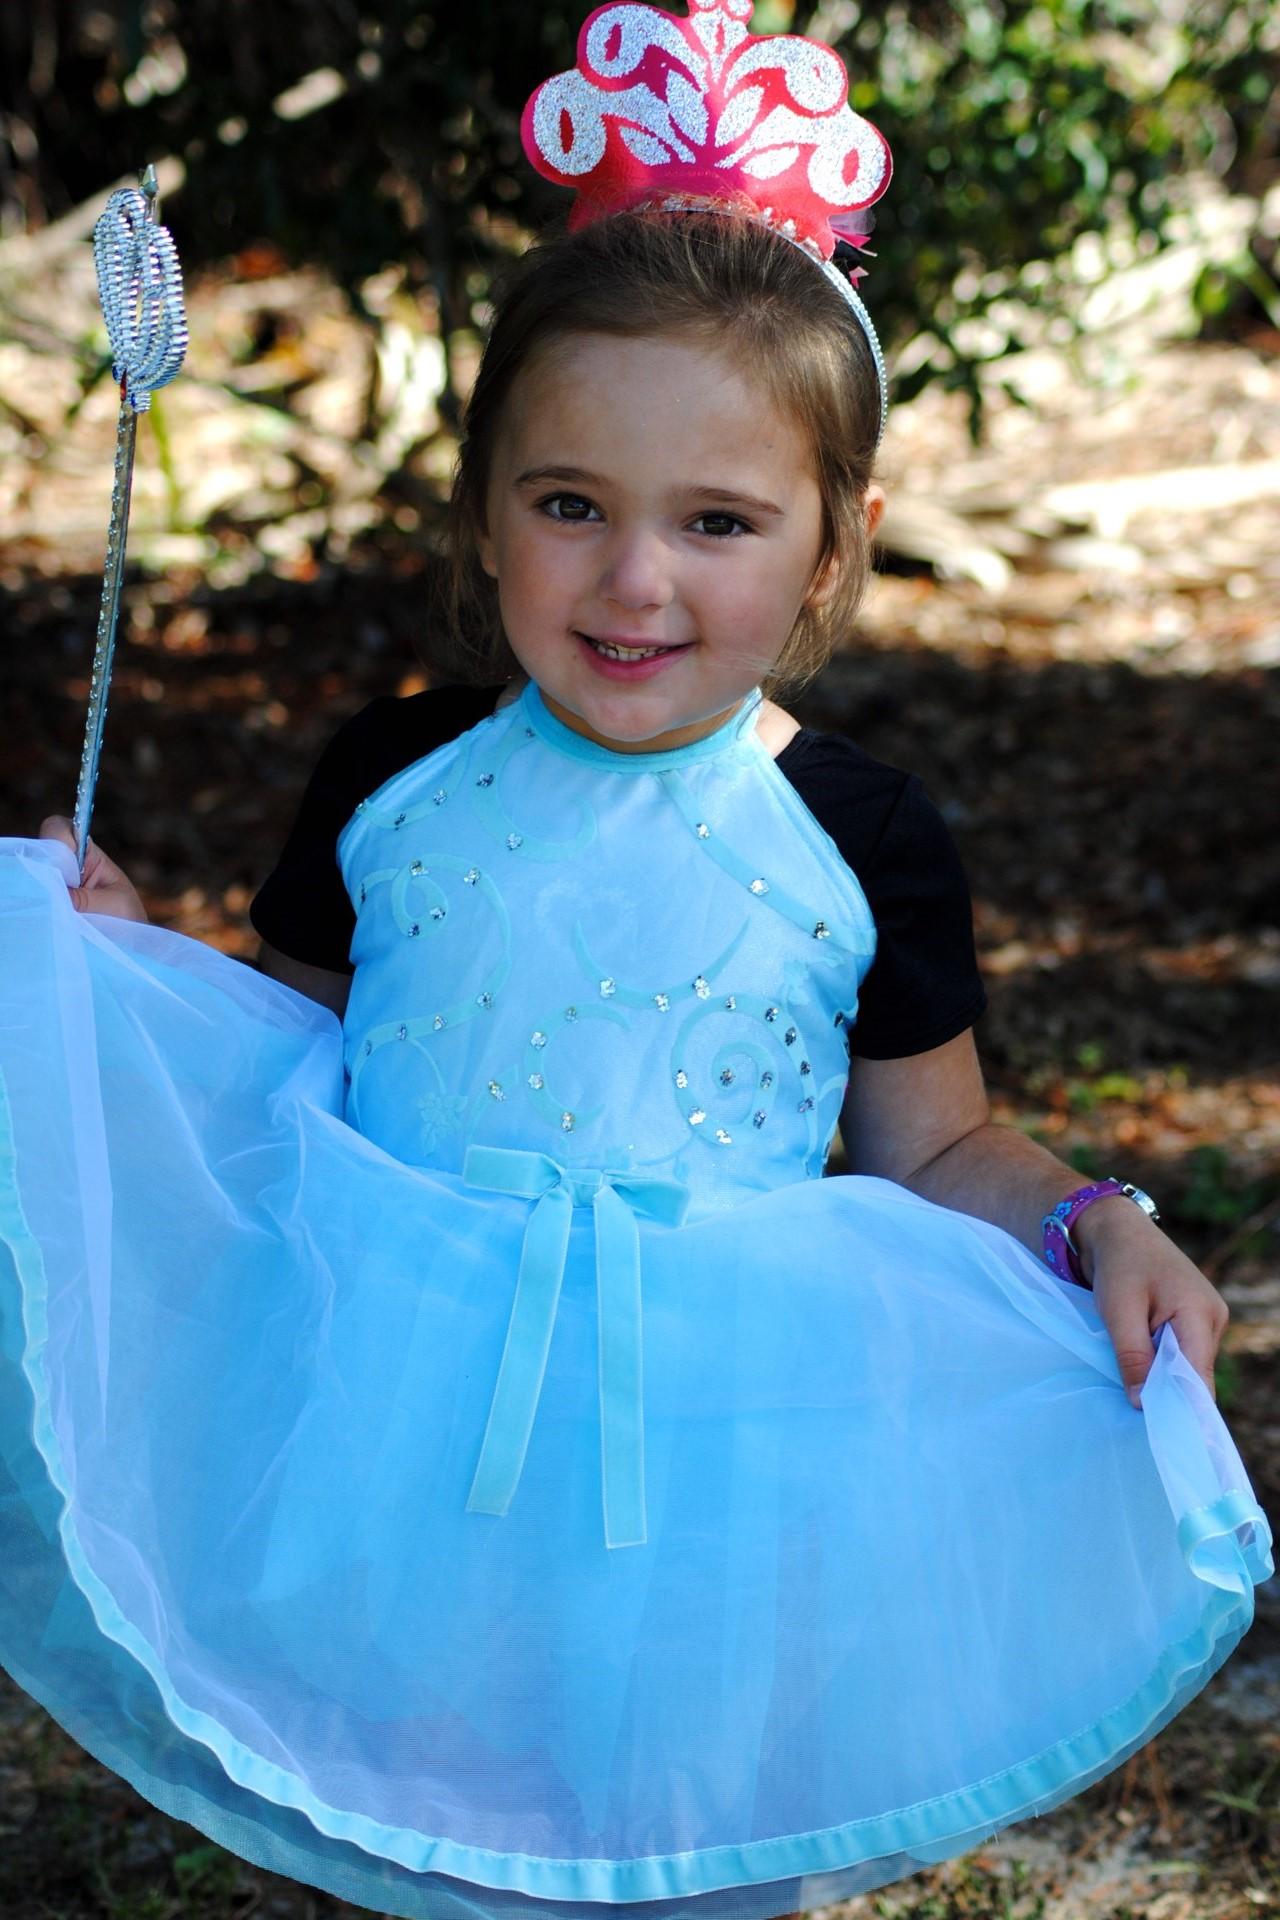 Little girl in princess costume